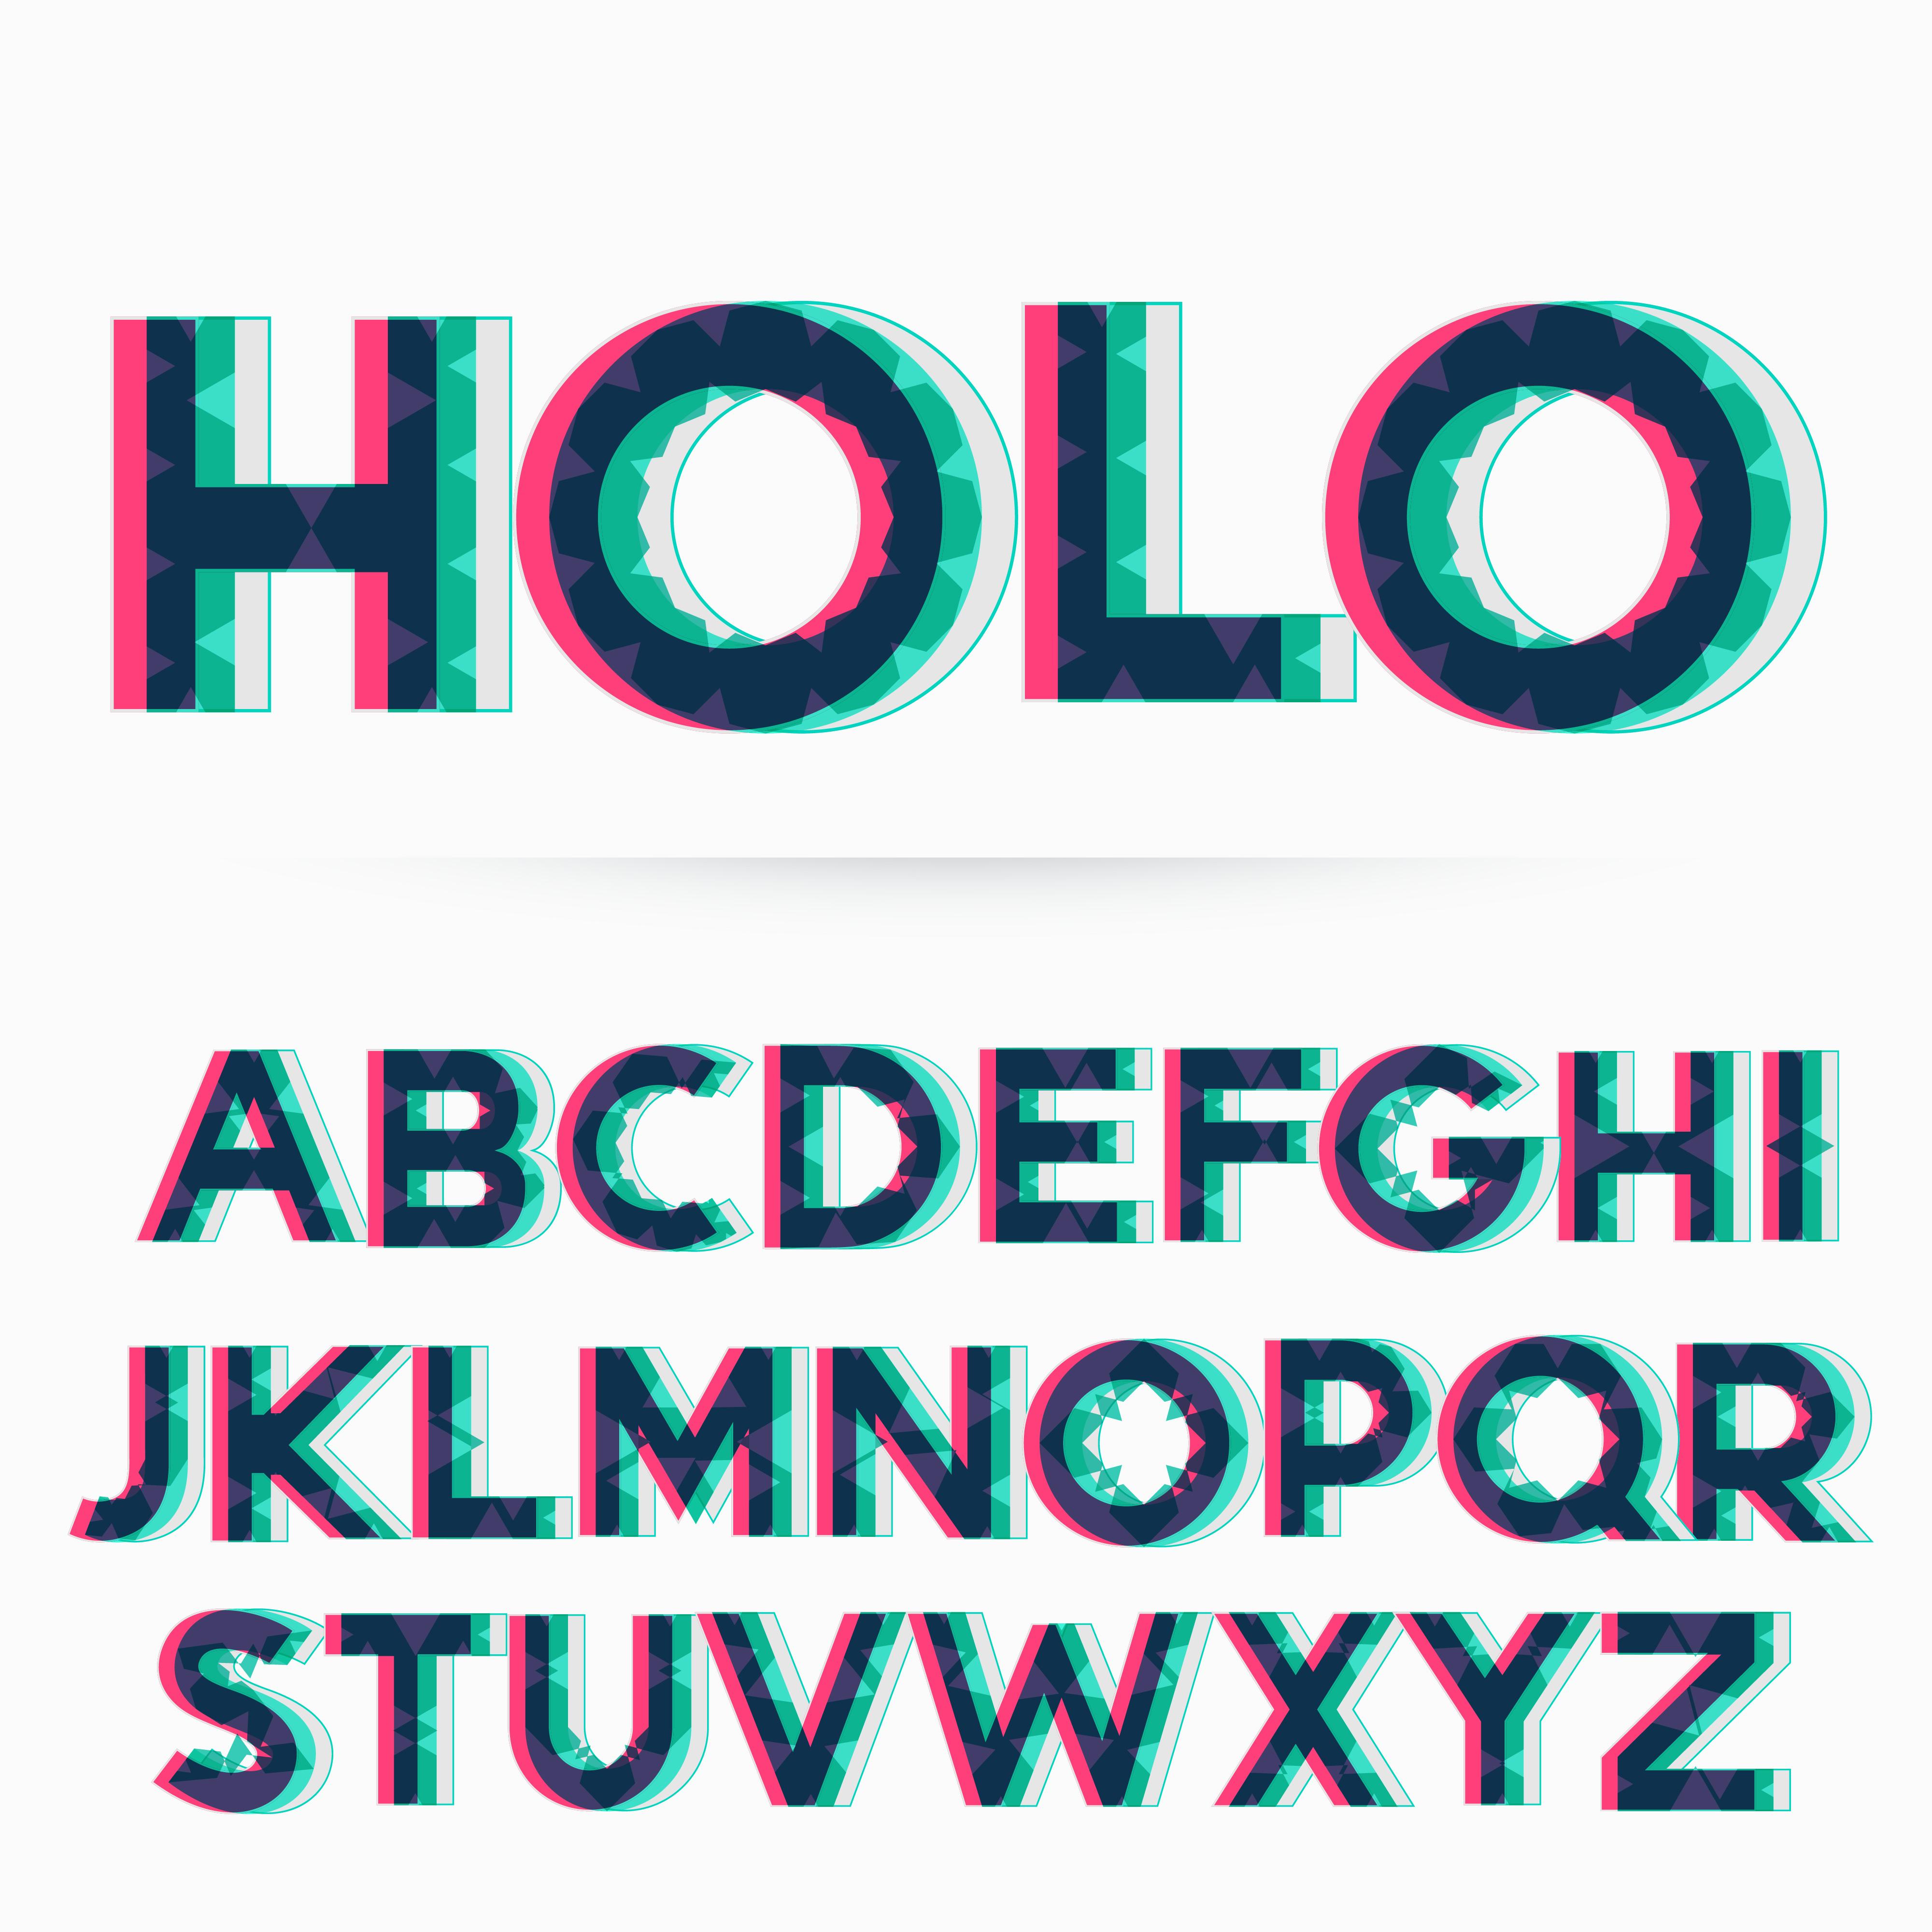 holographic-alphabet-font-vector-illustration Pixel Letter Template on letter word template, letter art template, letter fish template, letter font template, letter animal template, letter paper template, letter cm template, letter wizard template, letter maze template, letter design template,